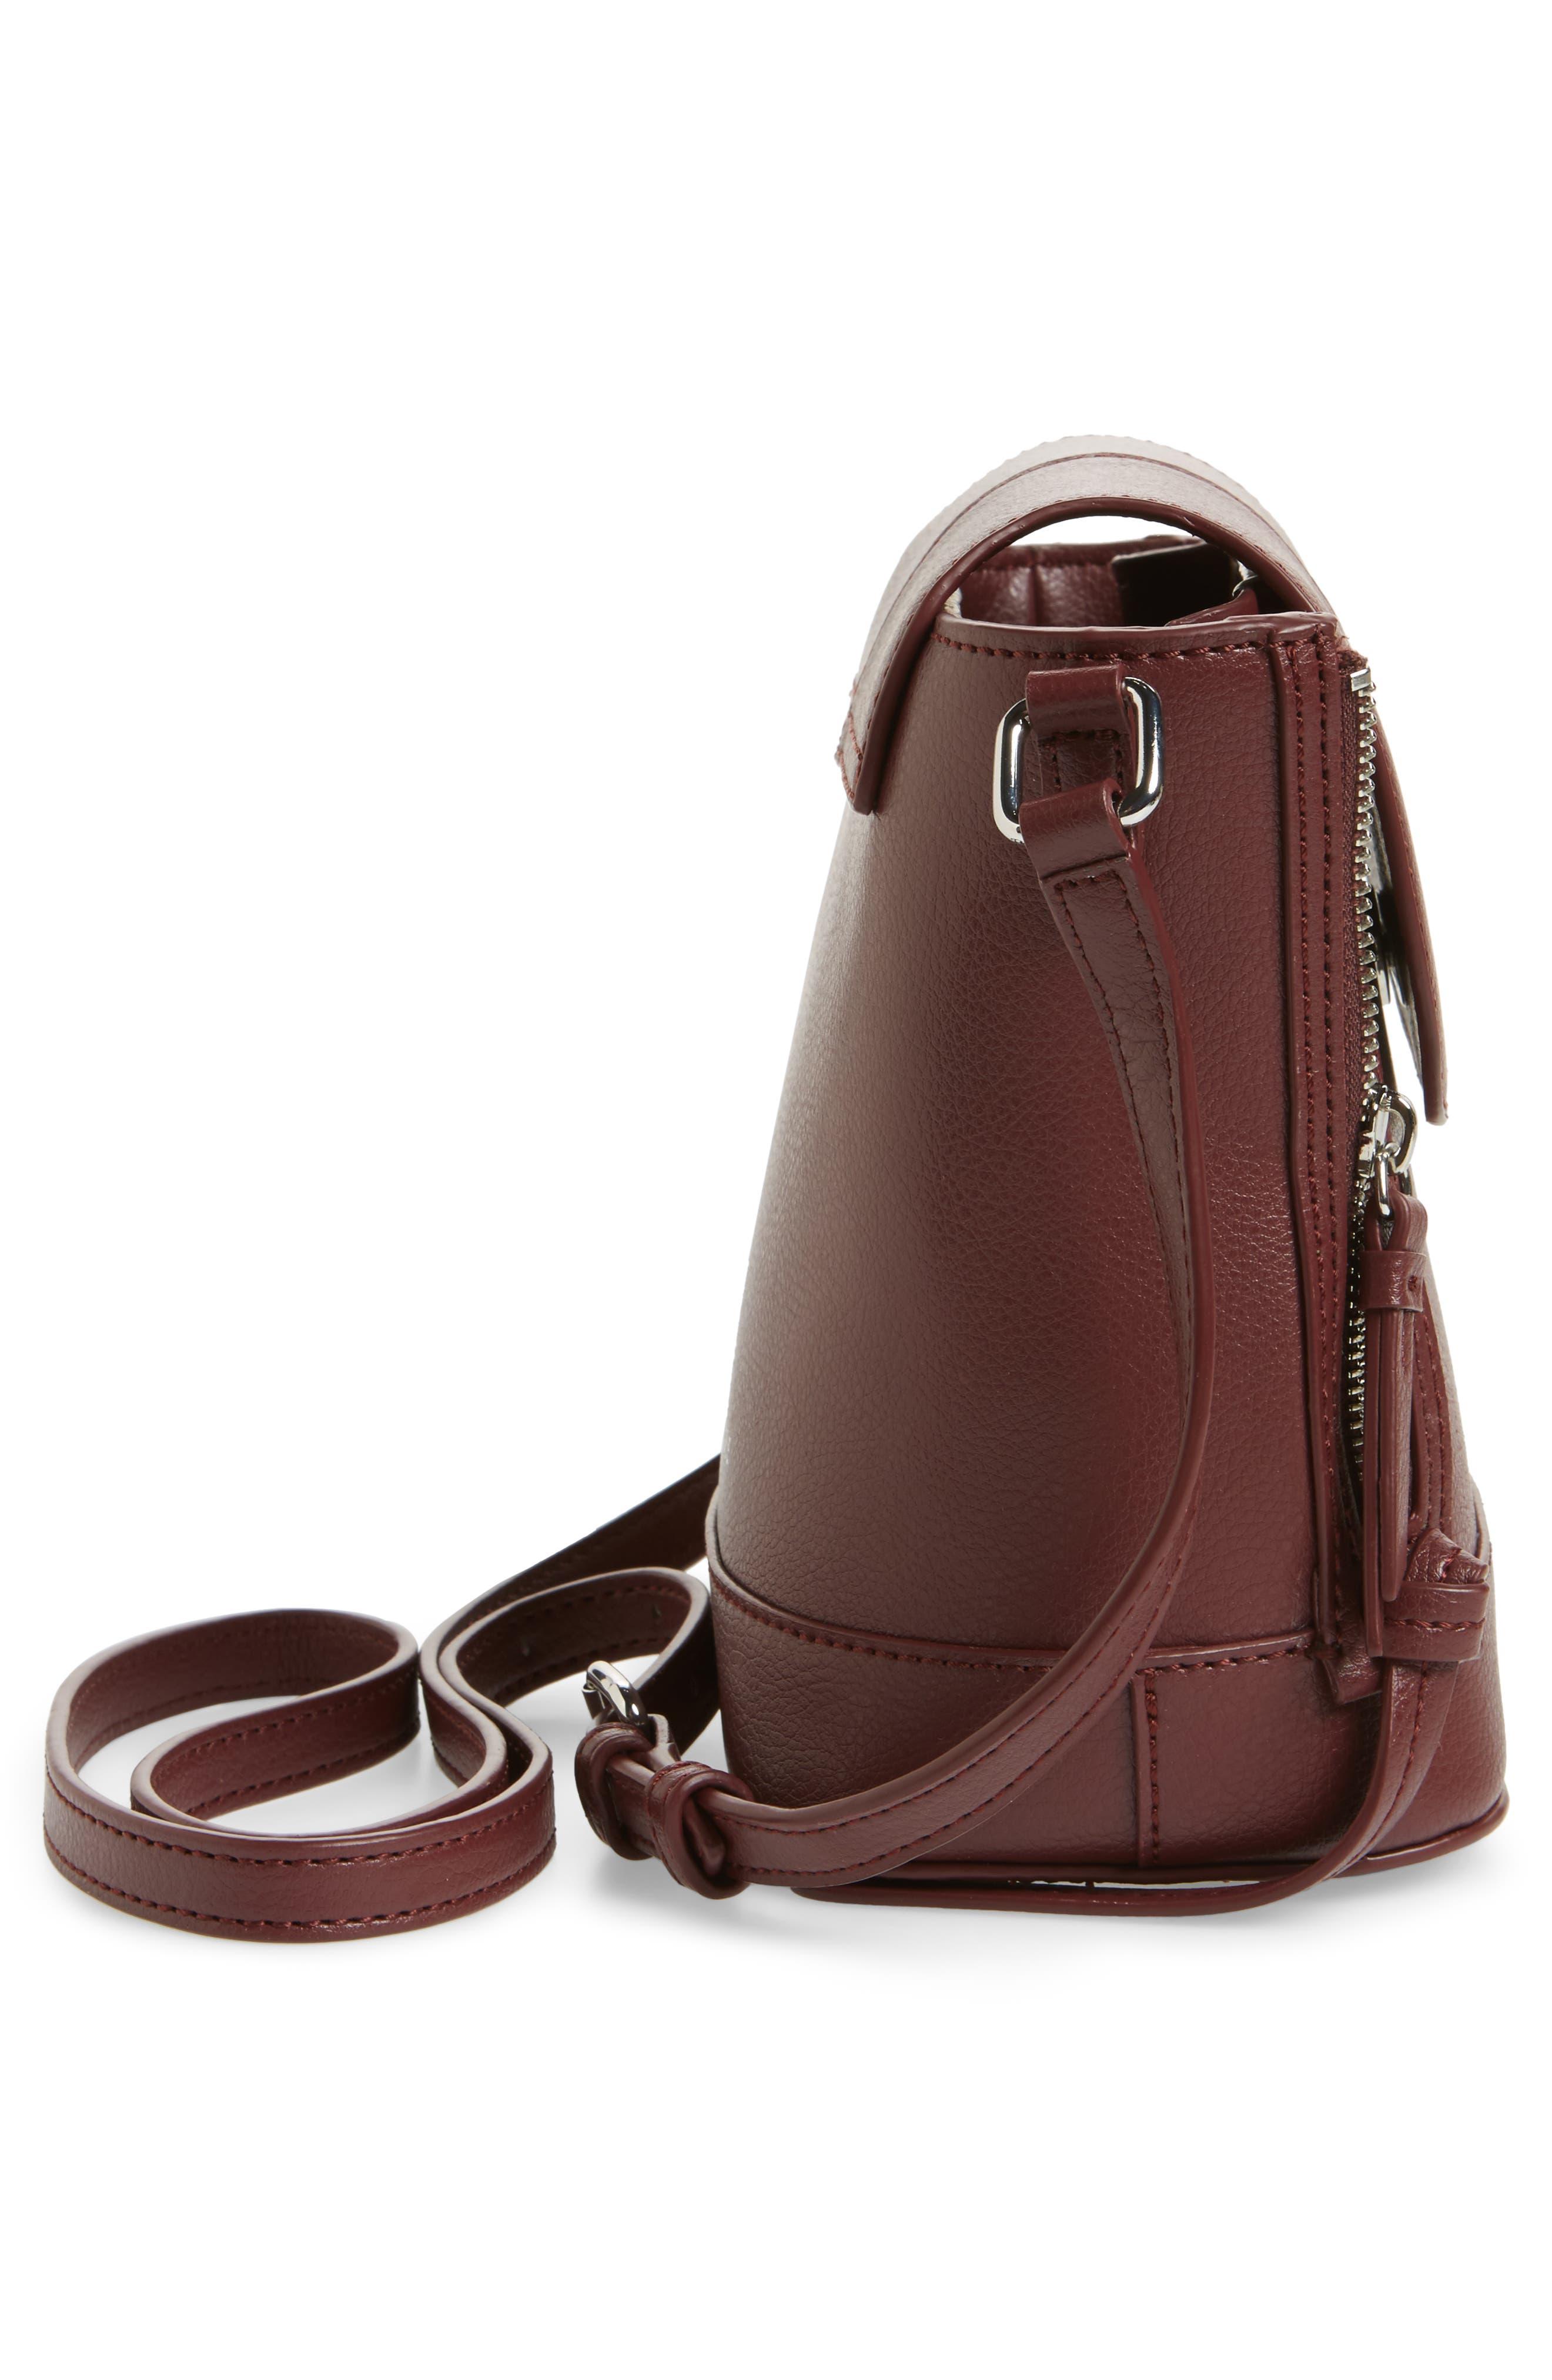 Beckett Leather Crossbody Bag,                             Alternate thumbnail 5, color,                             Wine